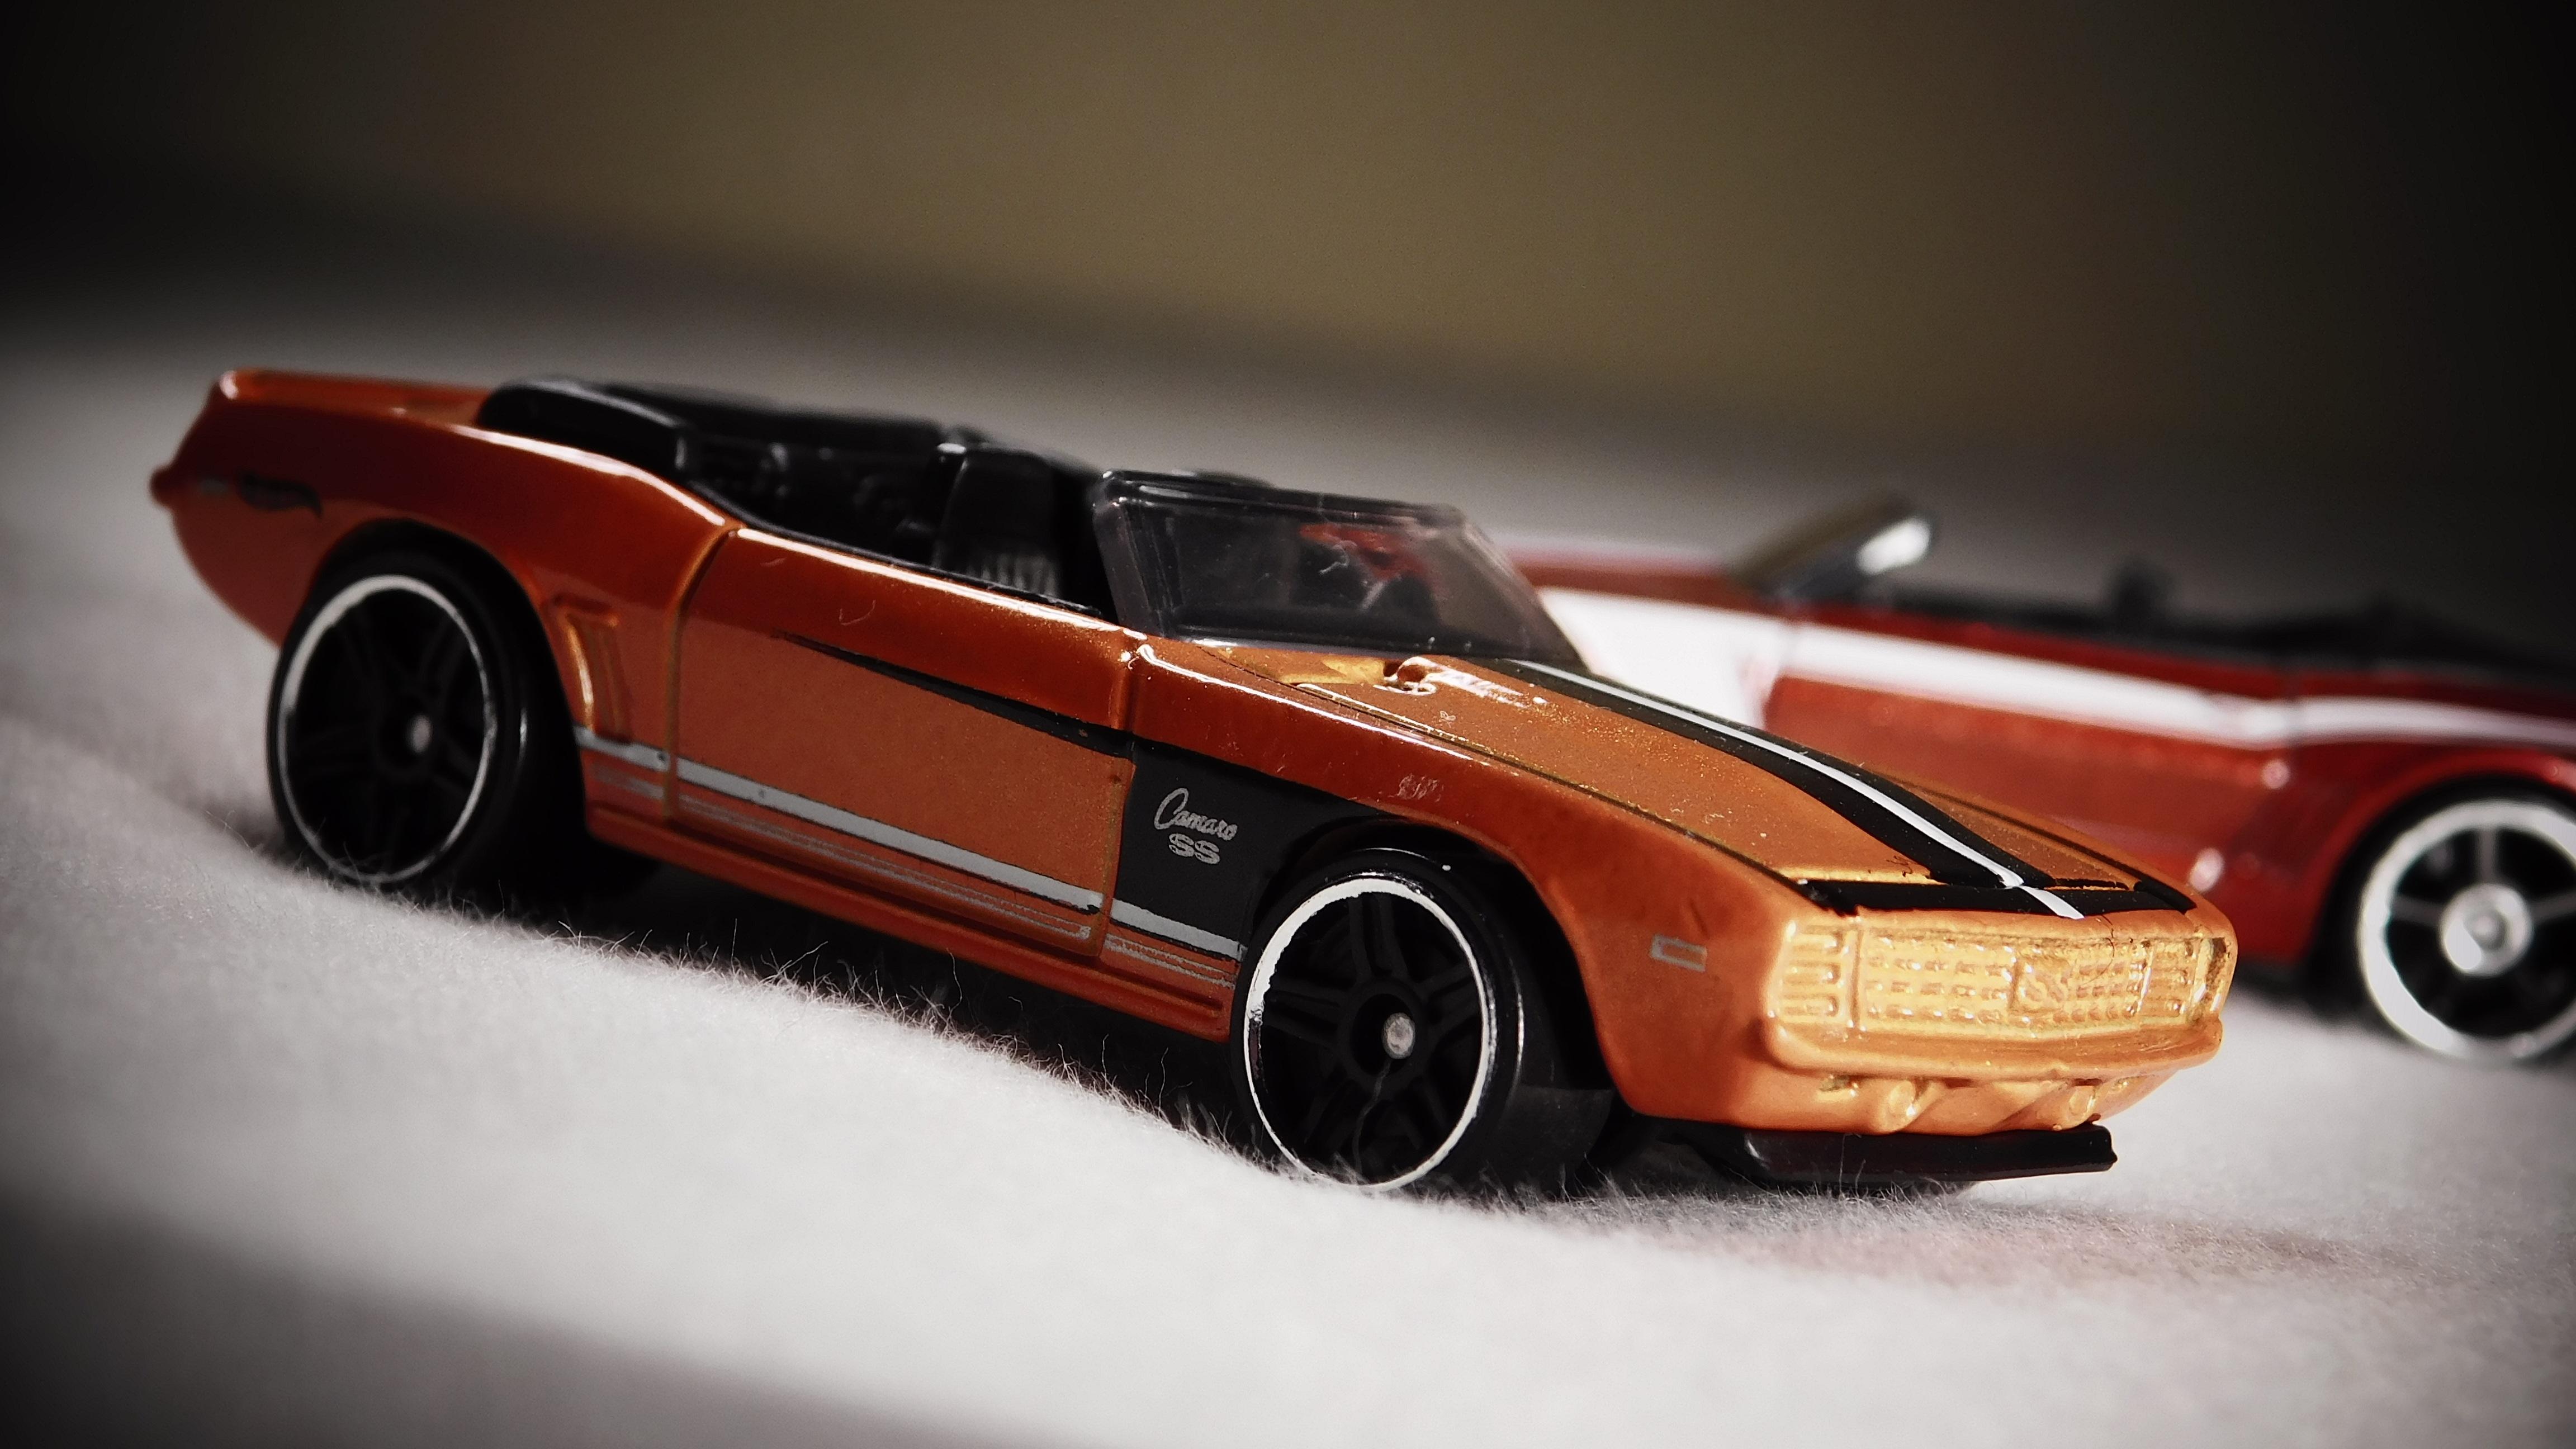 free images : orange, sports car, miniature, muscle car, race car